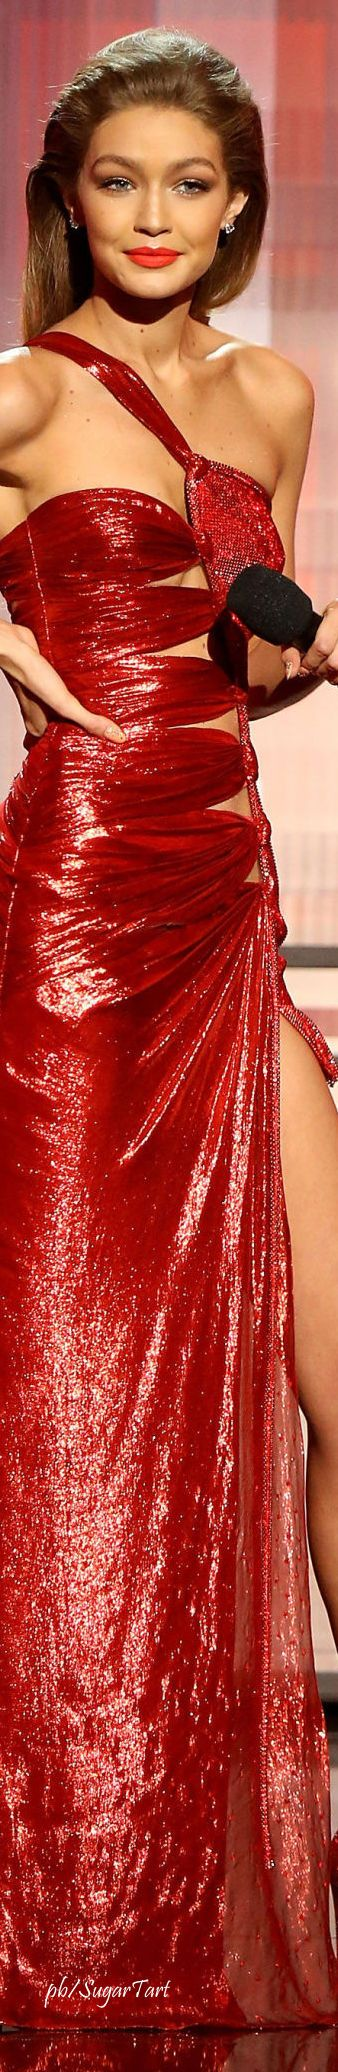 Gigi Hadid - AMA's  ...She apologized...I love the gown...